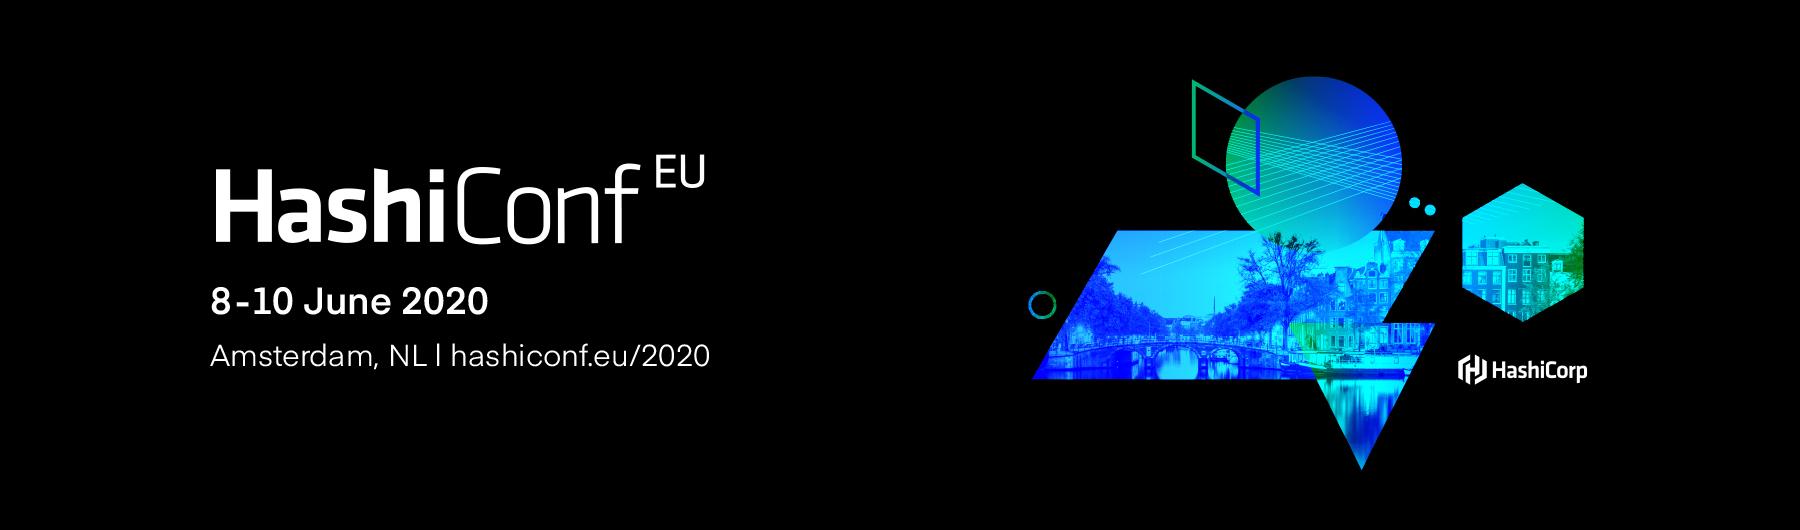 HashiConf EU 2020